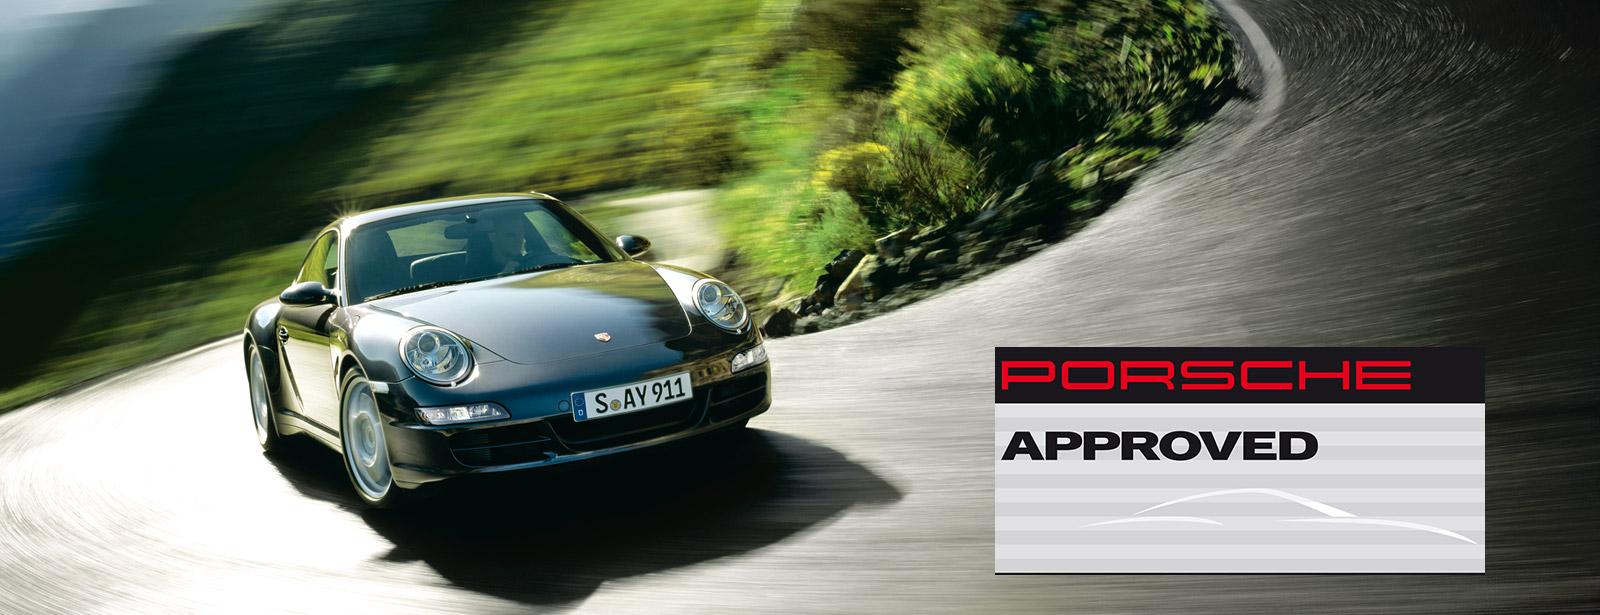 porsche approved Porsche amplia a sua garantia para automóveis até 15 anos